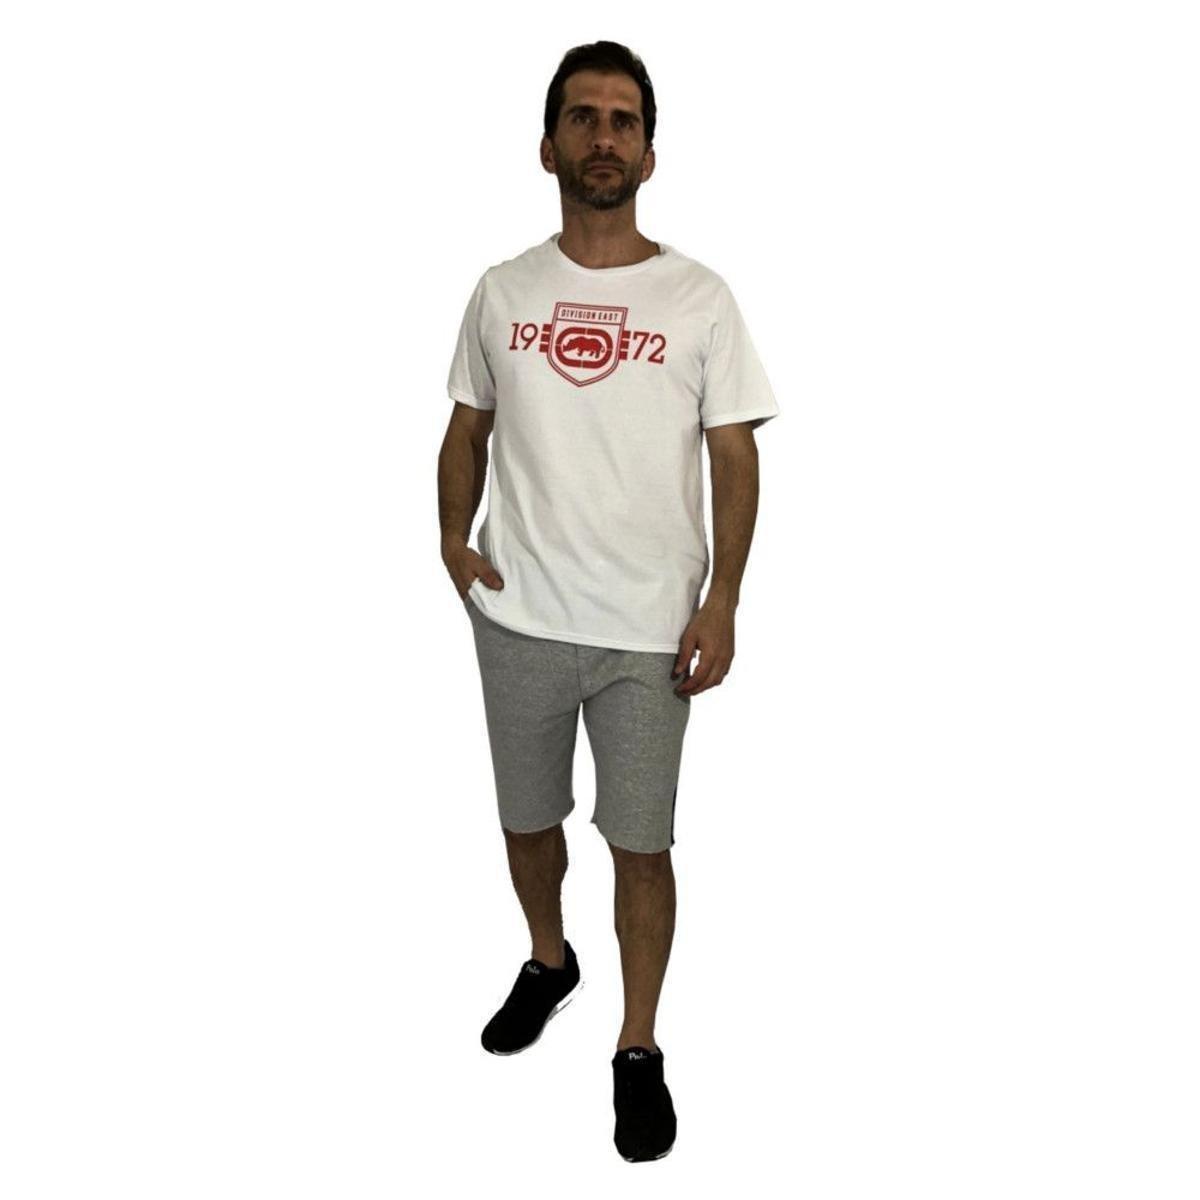 Camiseta Ecko Division East Masculina - Branco